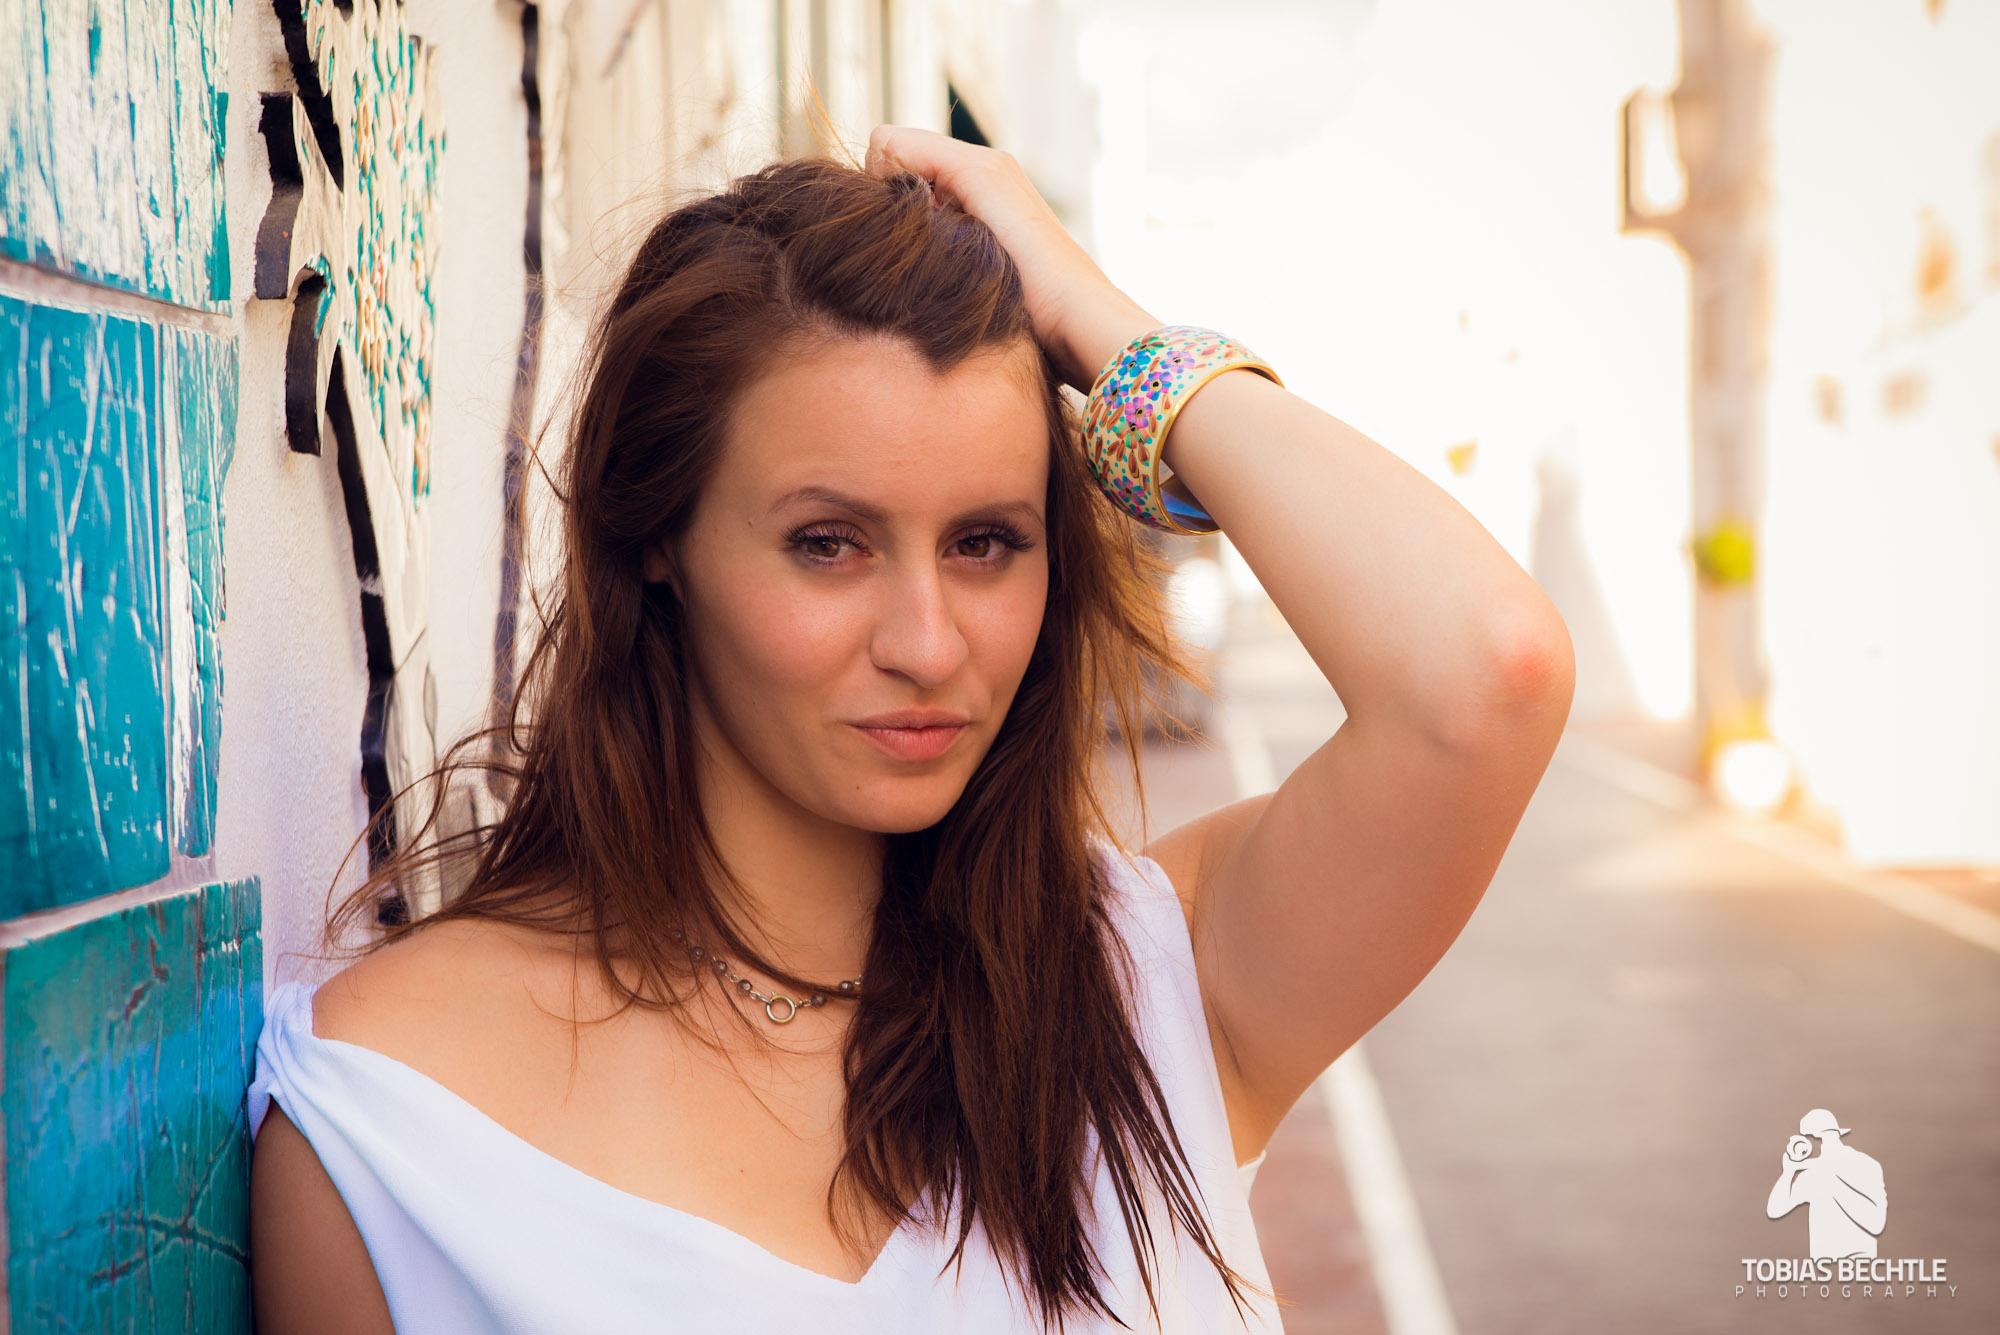 Lucy Malaga #1